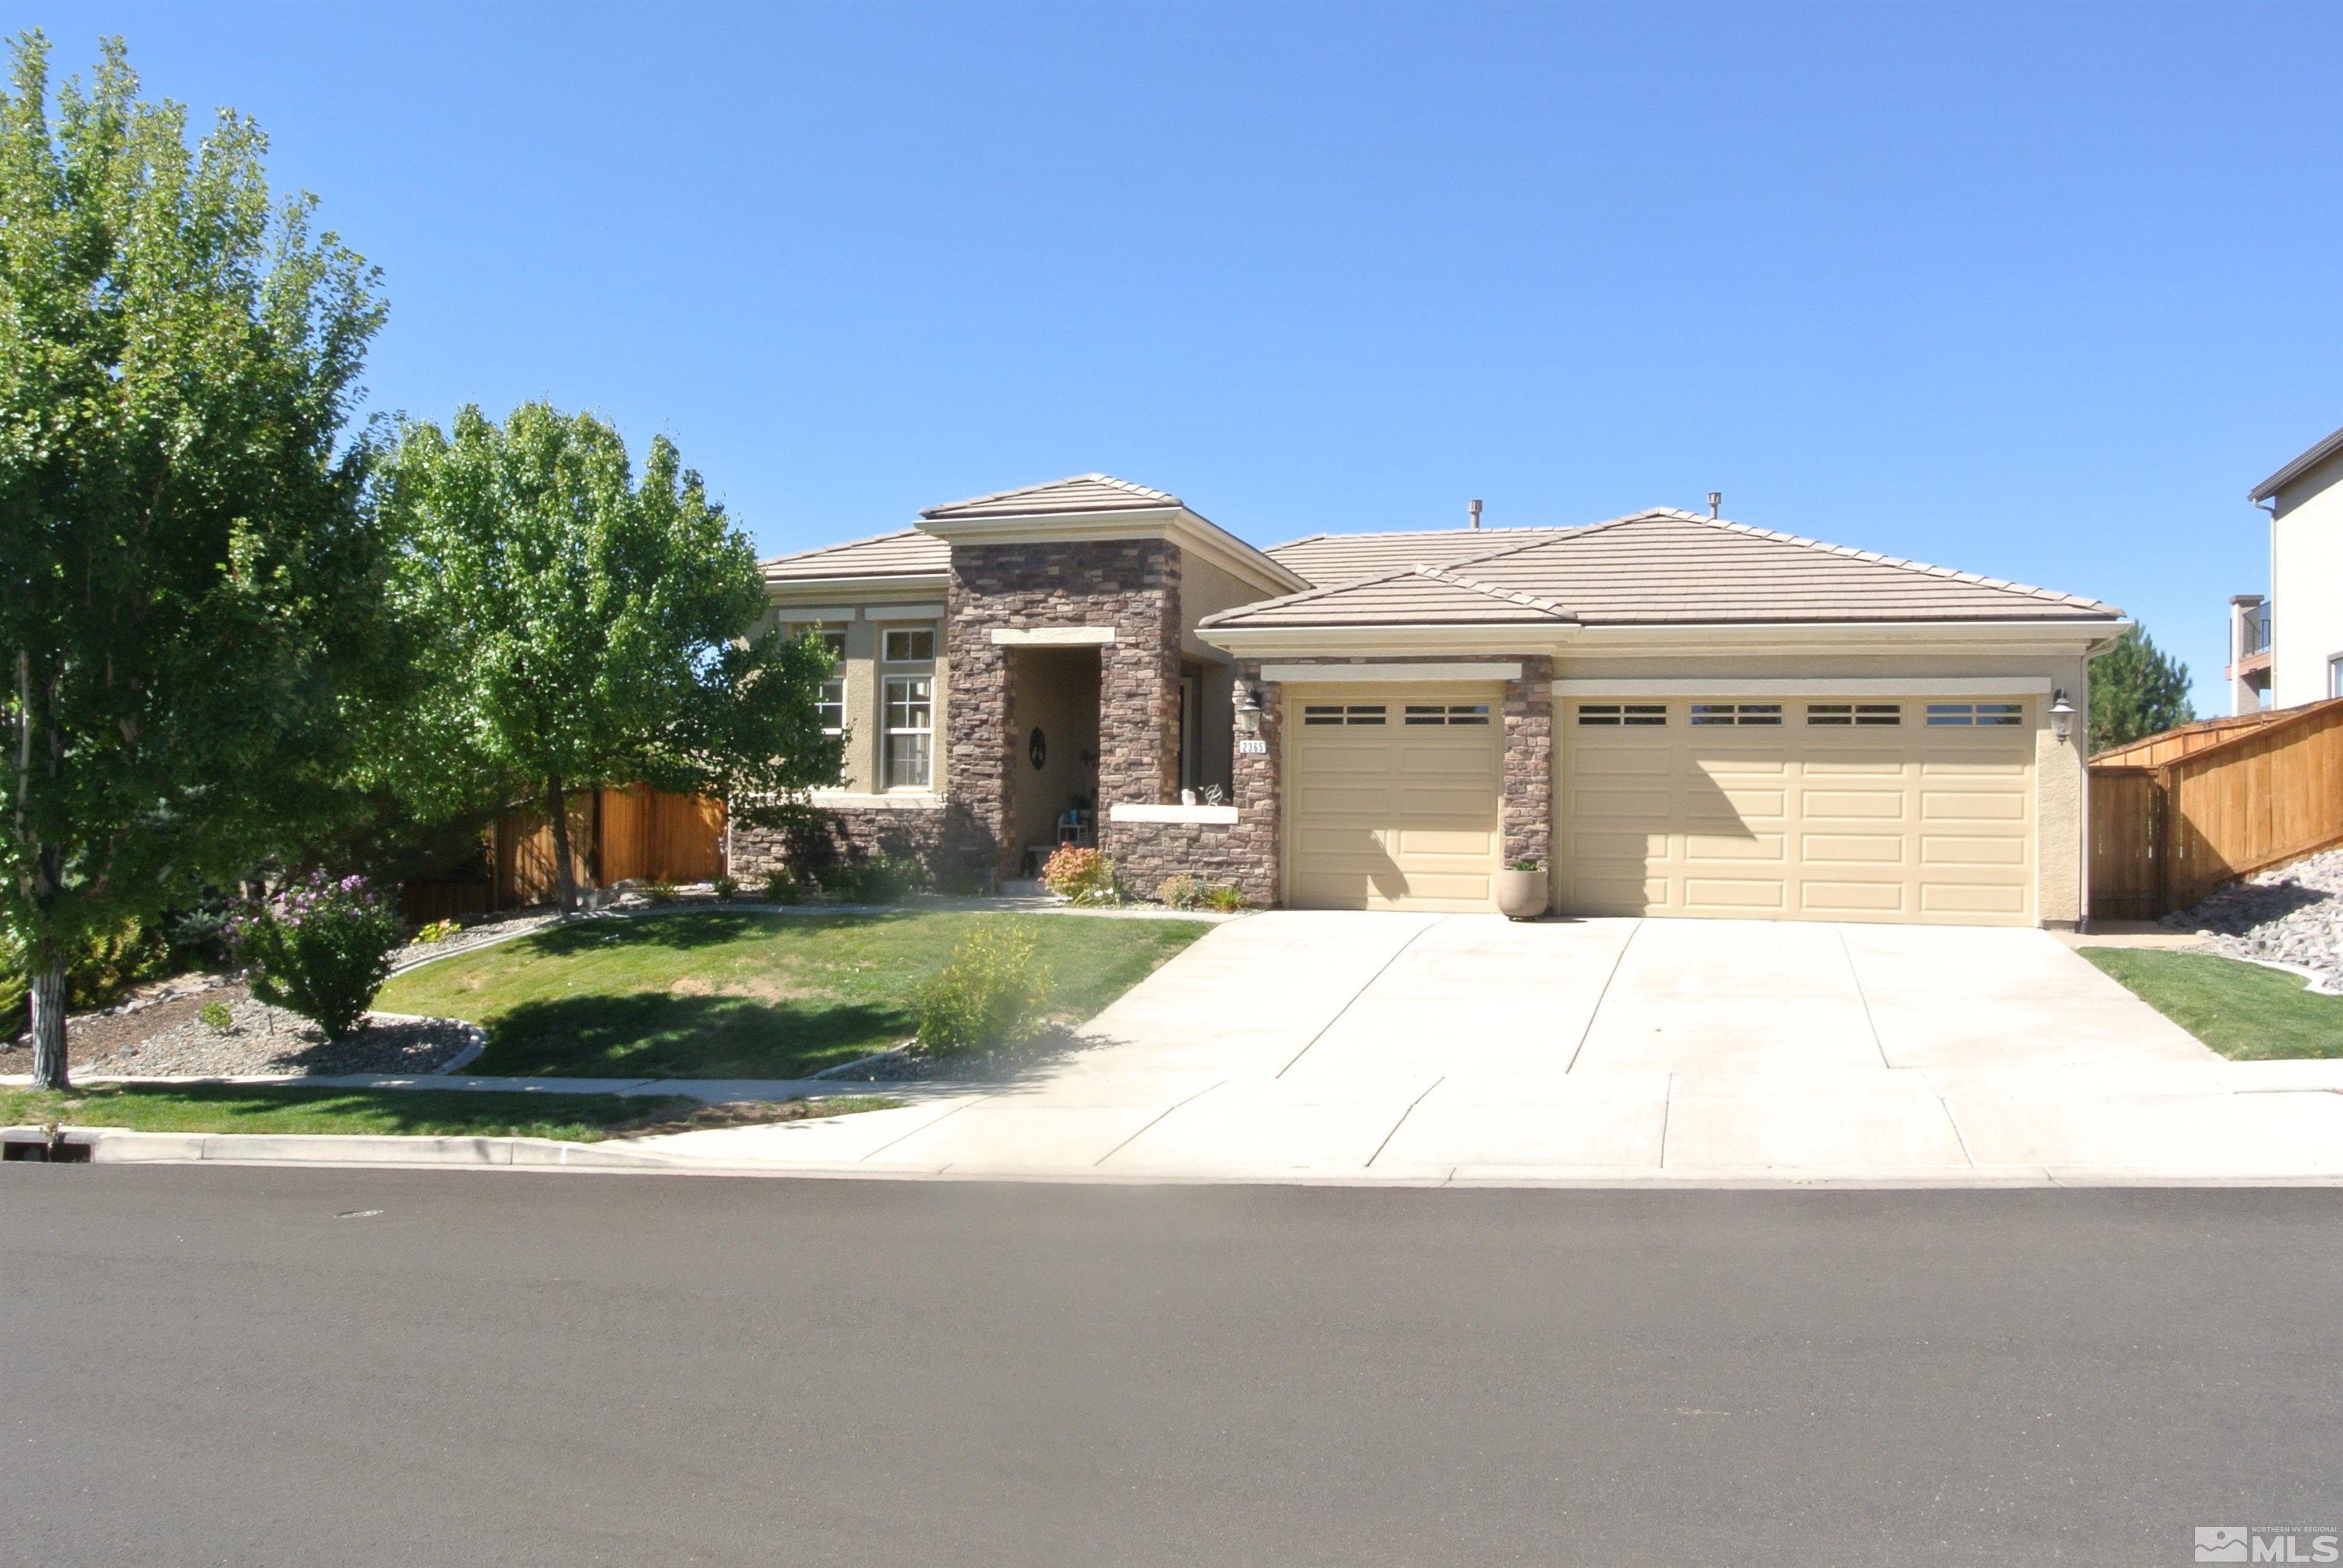 Image for 2365 Peavine Valley Road, Reno, NV 89523